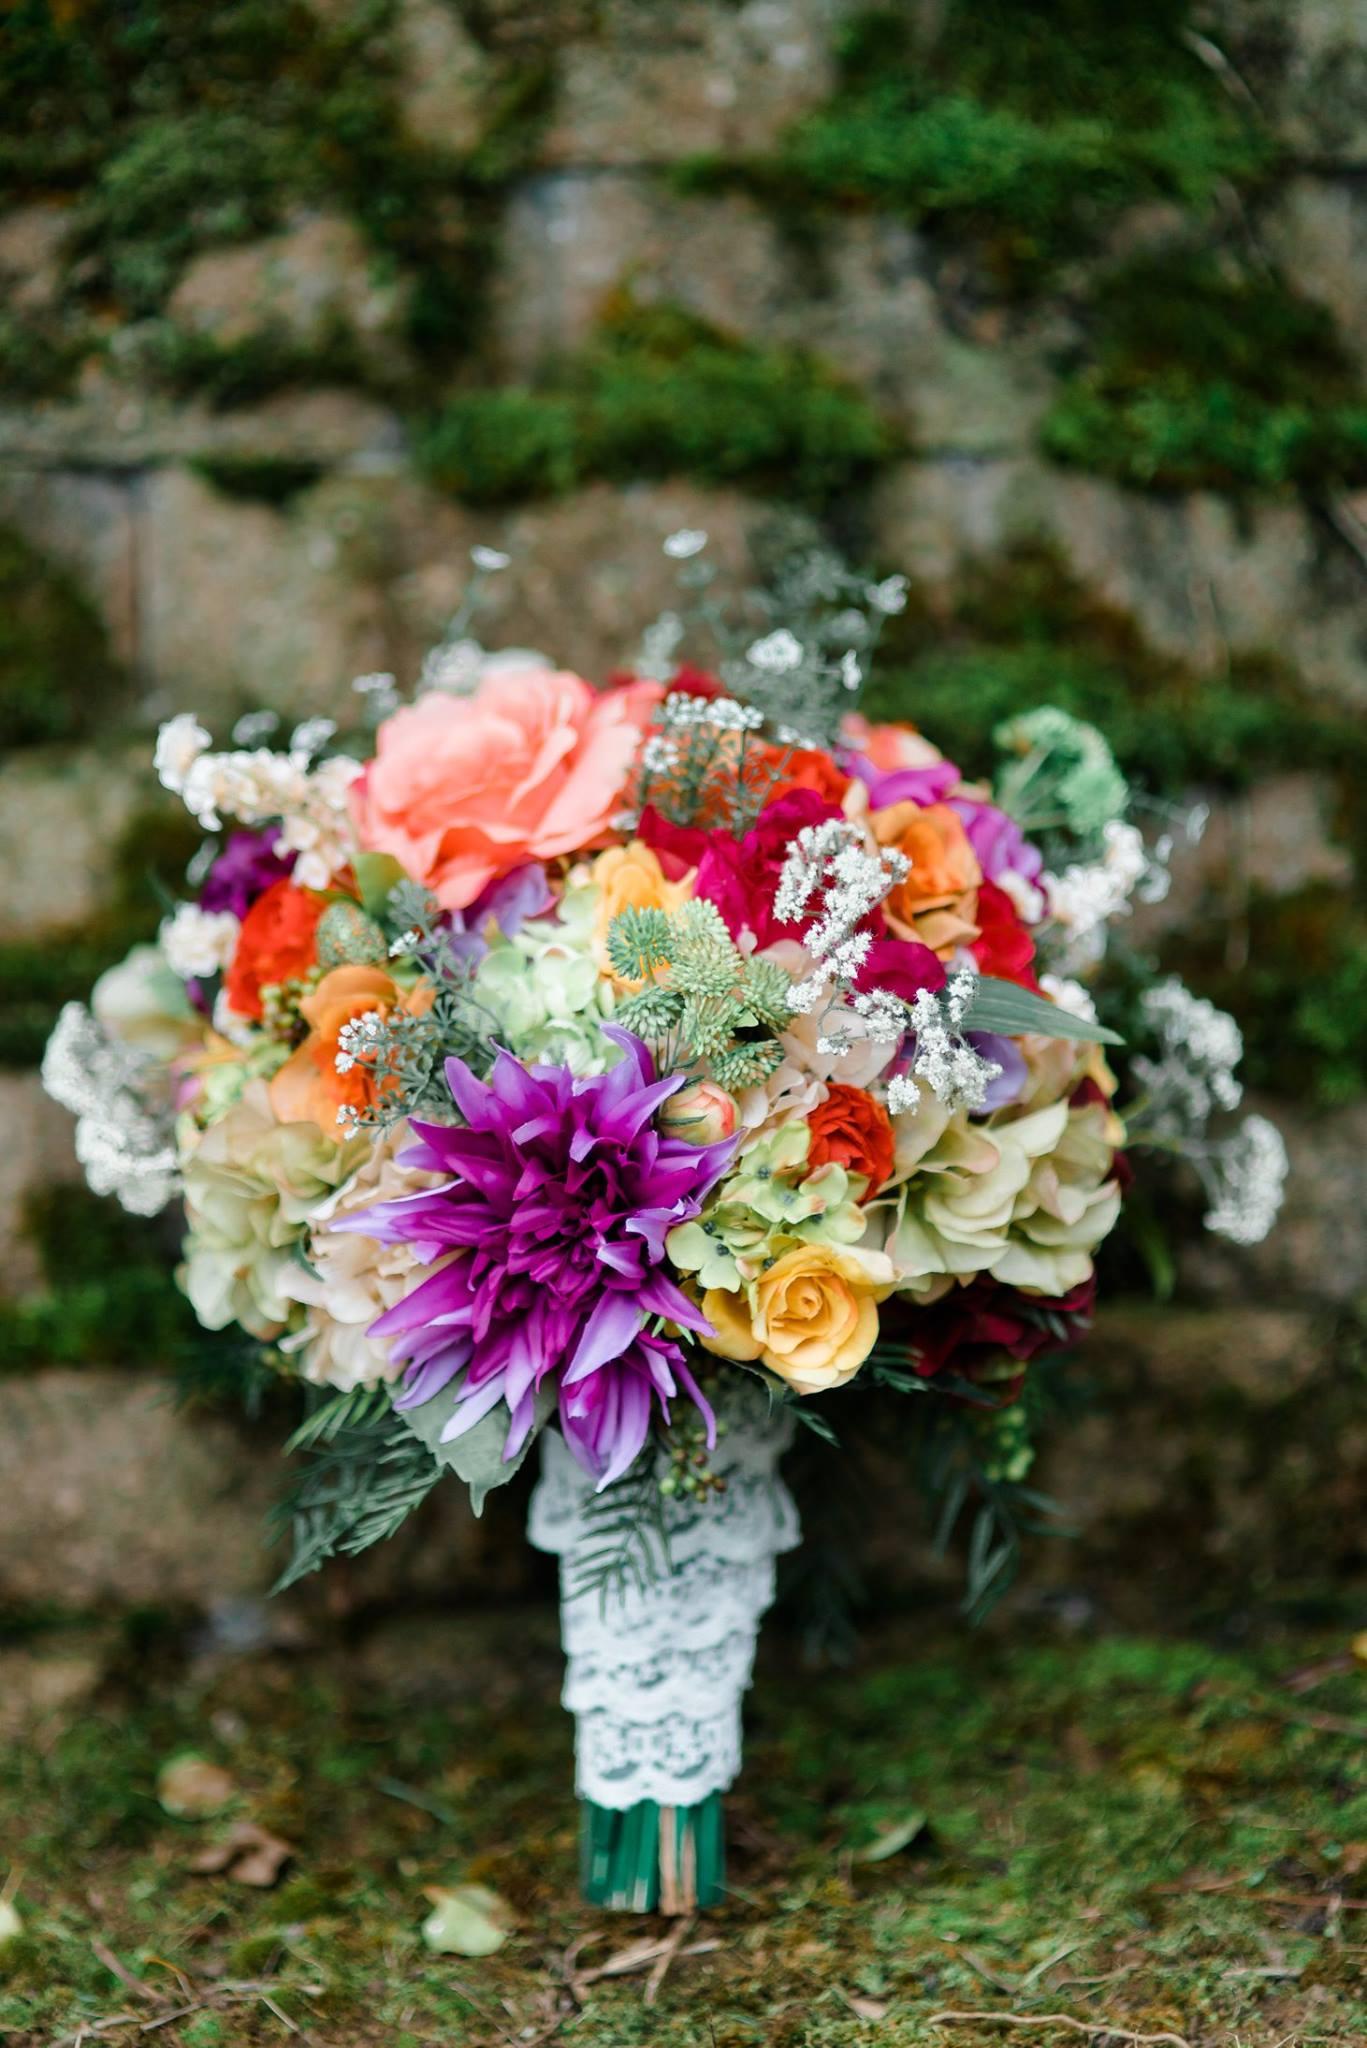 pennsylvania-backyard-wedding-love-diy-bohemian-romantic-colorful-0004.jpg